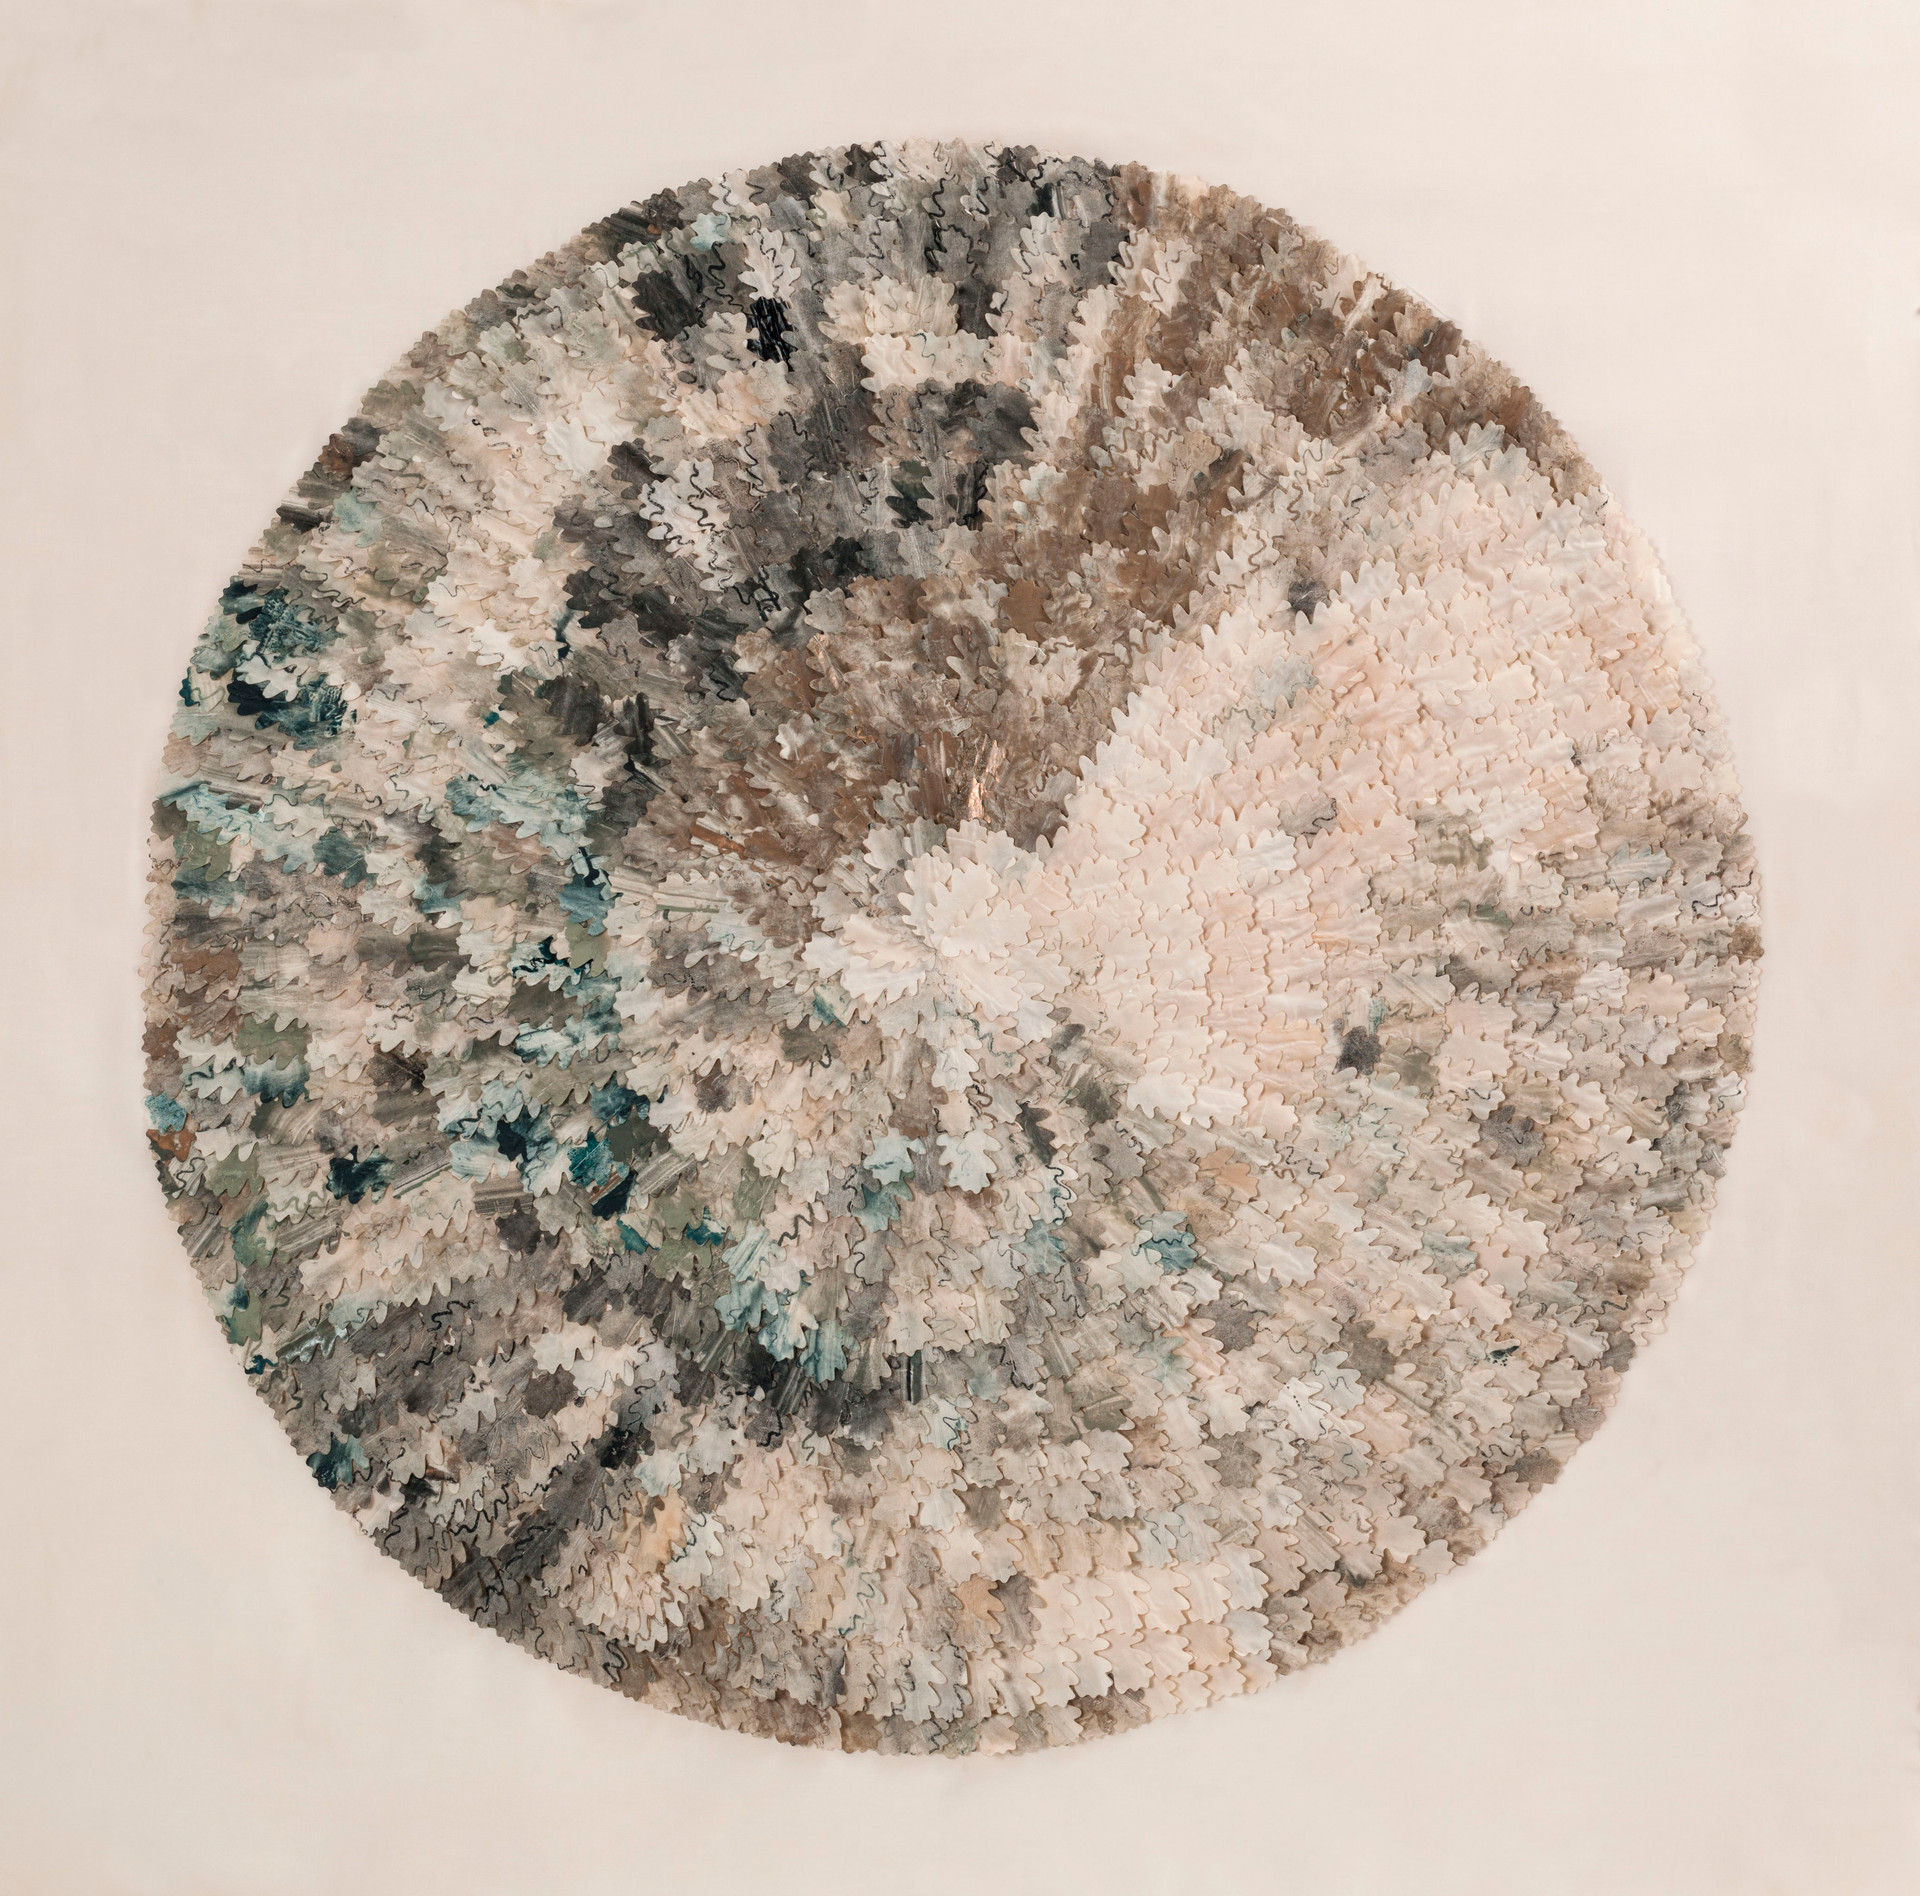 Winter oak/2014/Silk Paper Etching/120x120 cm